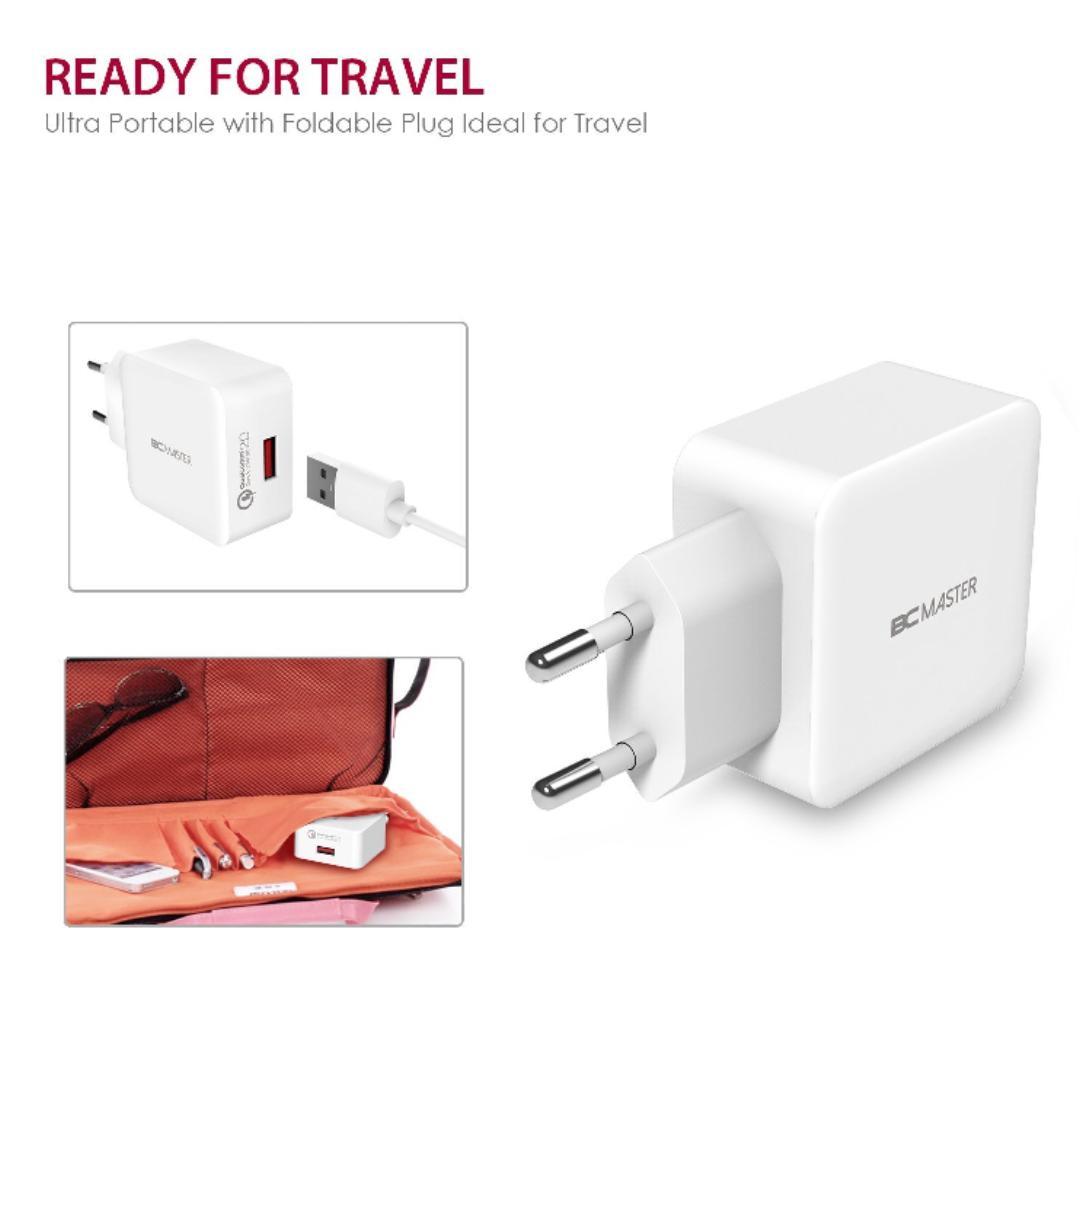 Chargeur secteur Quickcharge 2.0  - 1 Port USB / 18W  BC Master